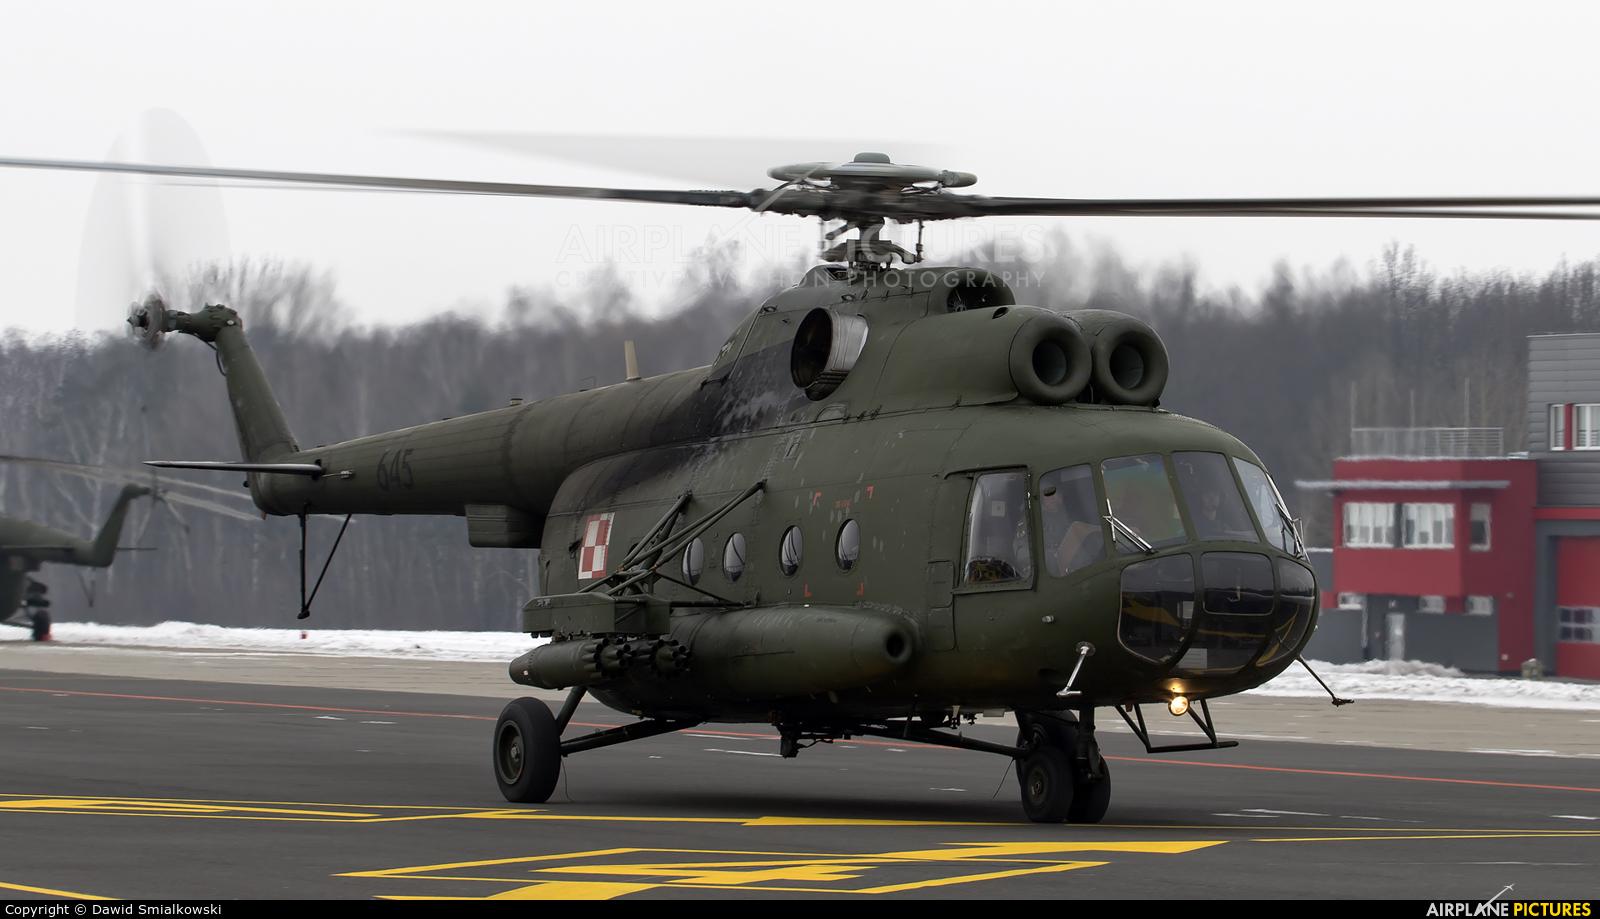 Poland - Army 645 aircraft at Leźnica Wielka